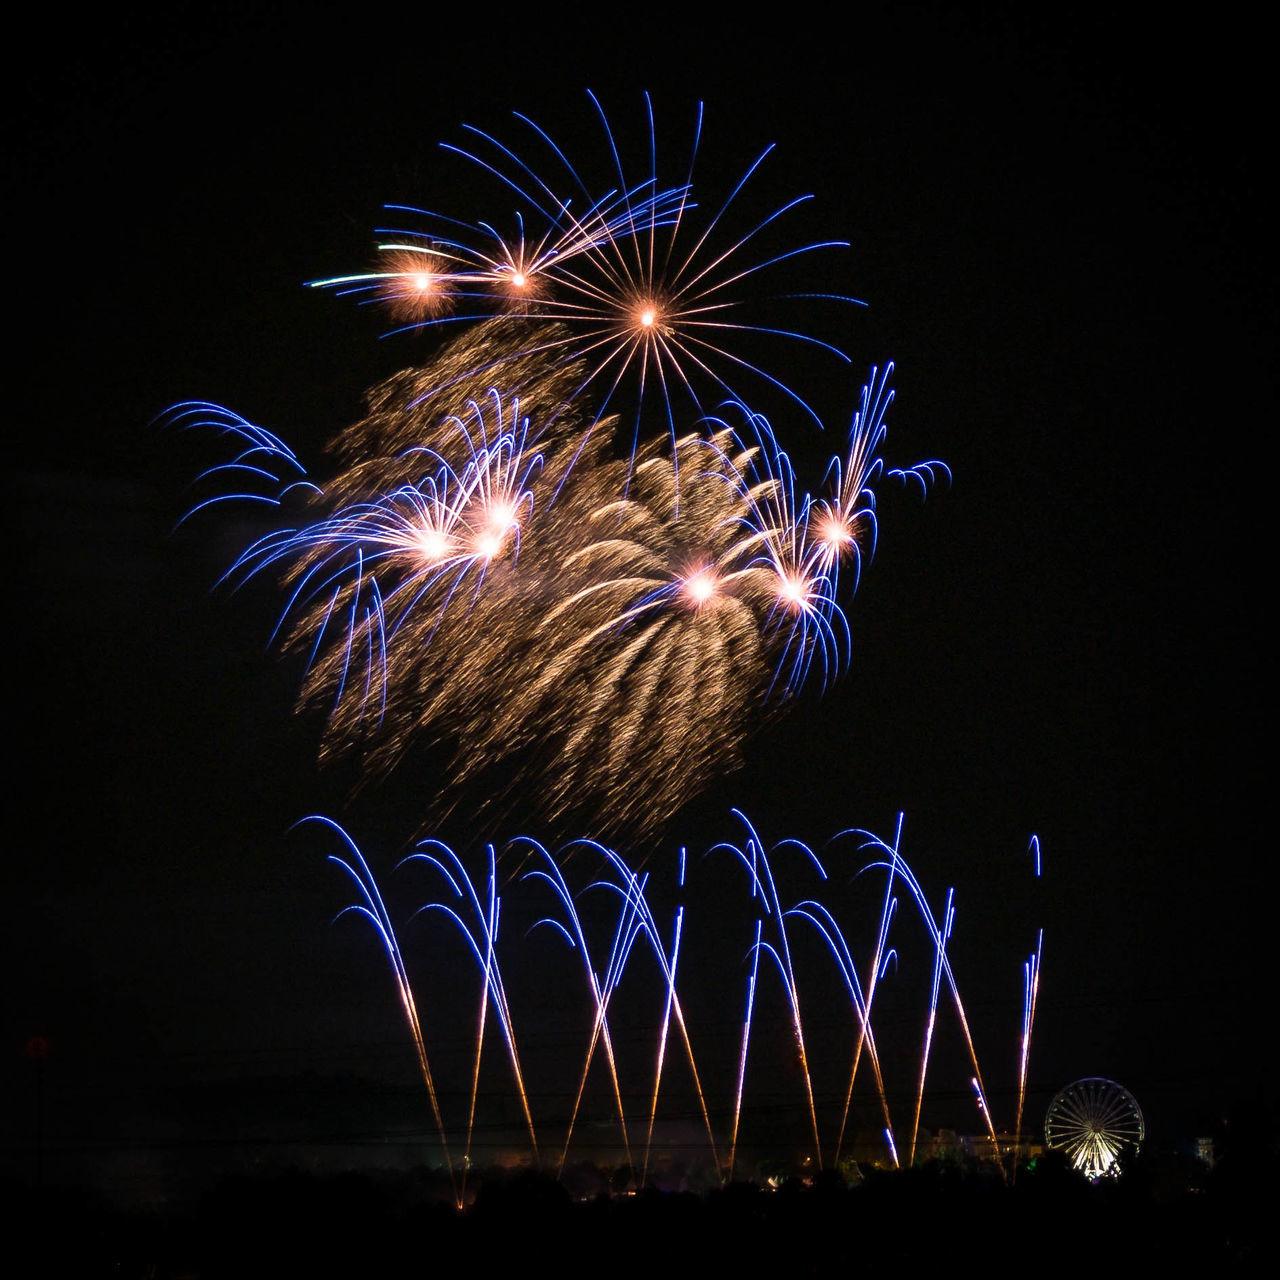 Flammende sterne Fireworks Firework Fireworksphotography Outdoors Blue Light And Shadow Light Feuerwerk Flammende Sterne Rocket Germany Filderstadt Ostfildern